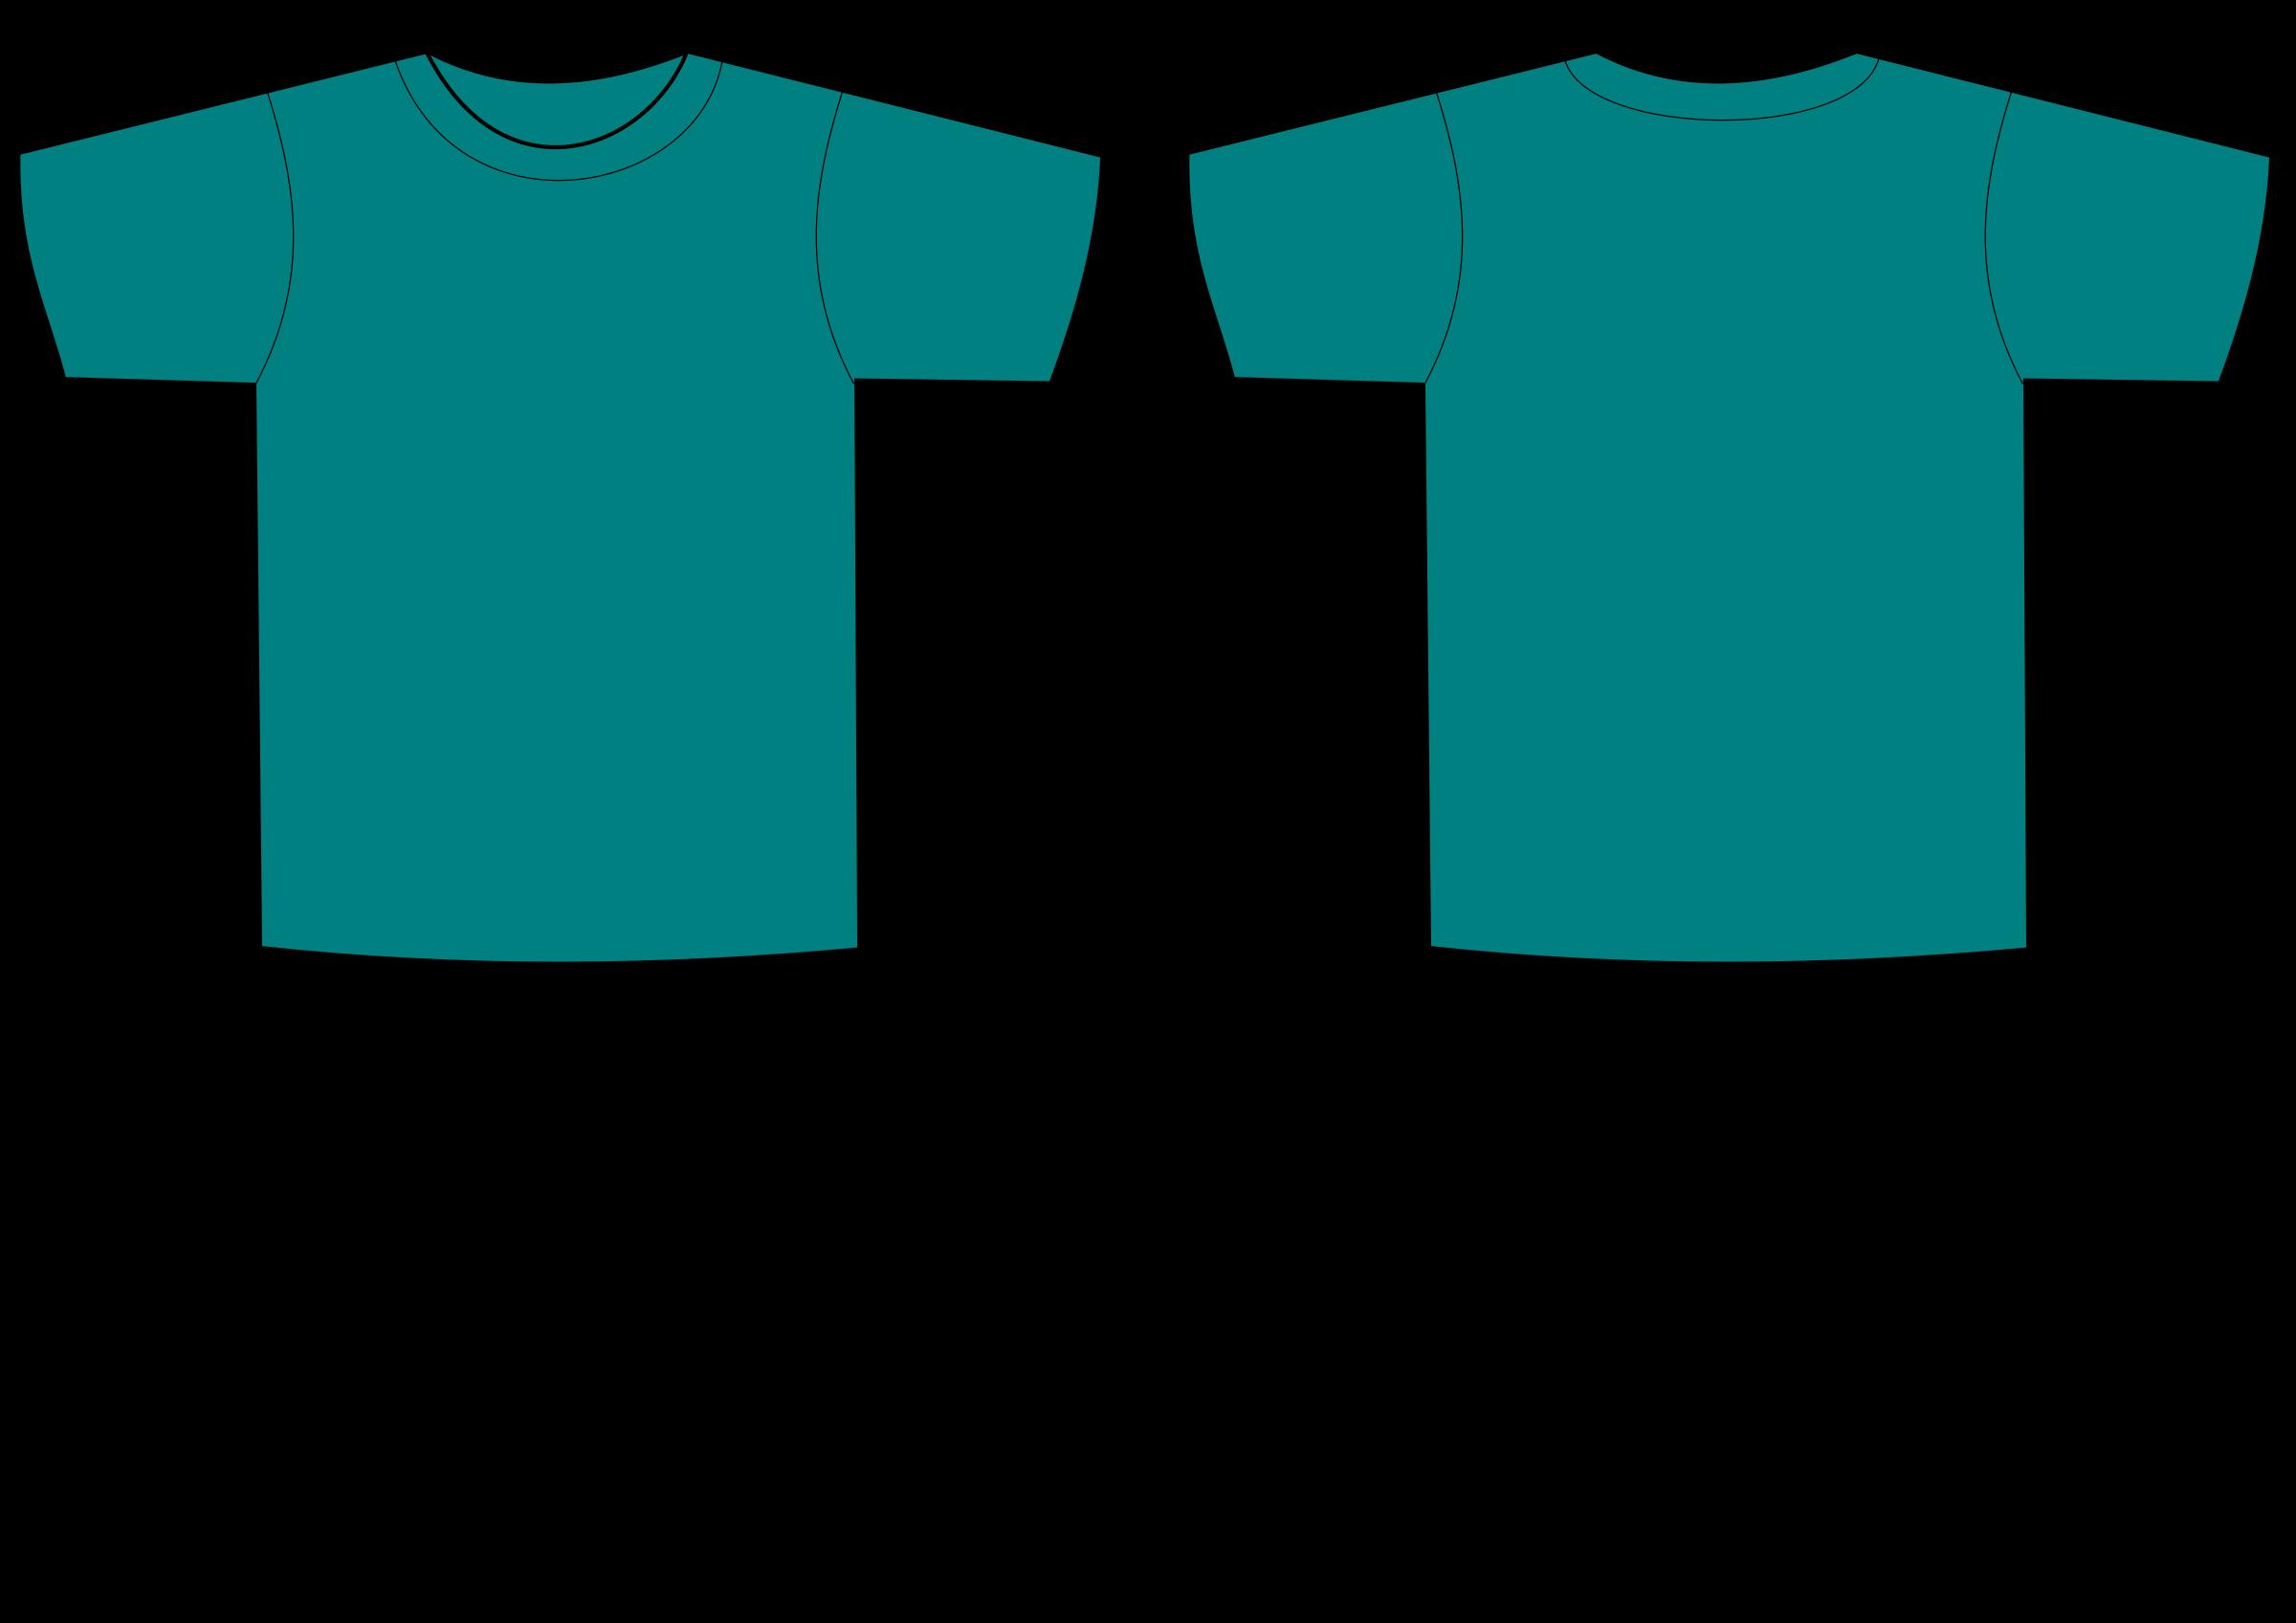 Shirts green shirt